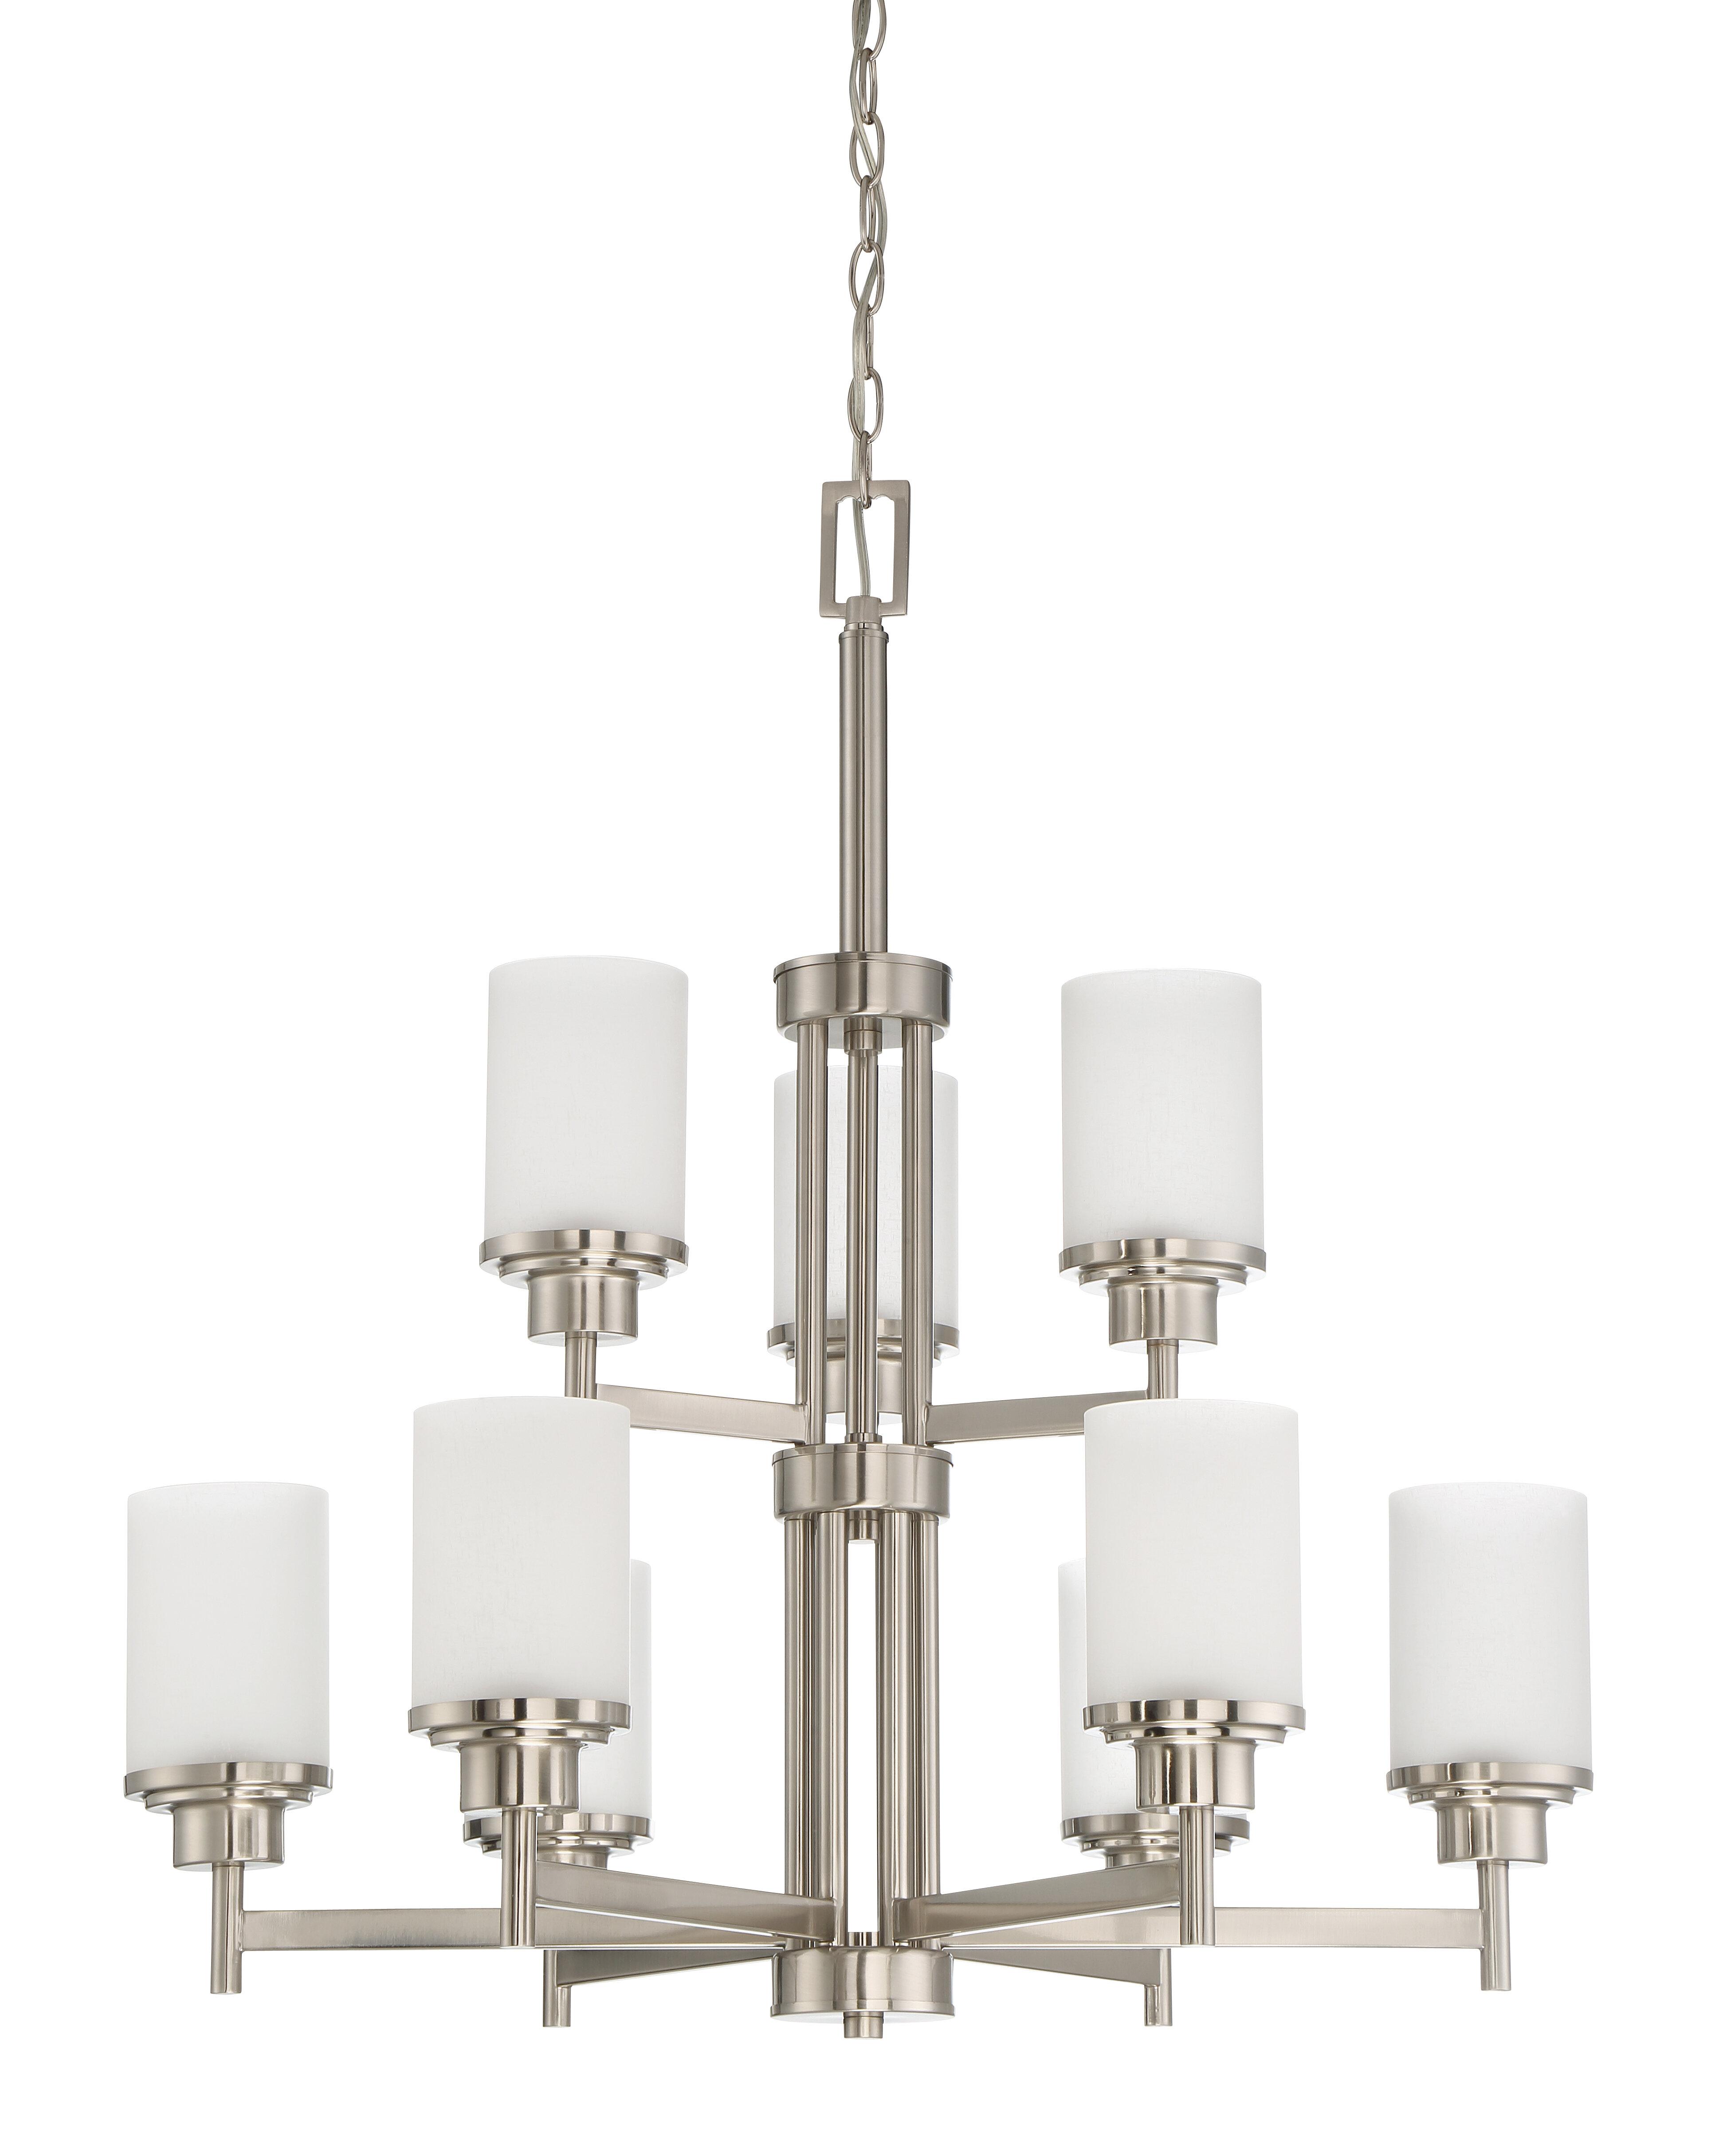 Ebern Designs Bristol 9 Light Shaded Tiered Chandelier Reviews Wayfair